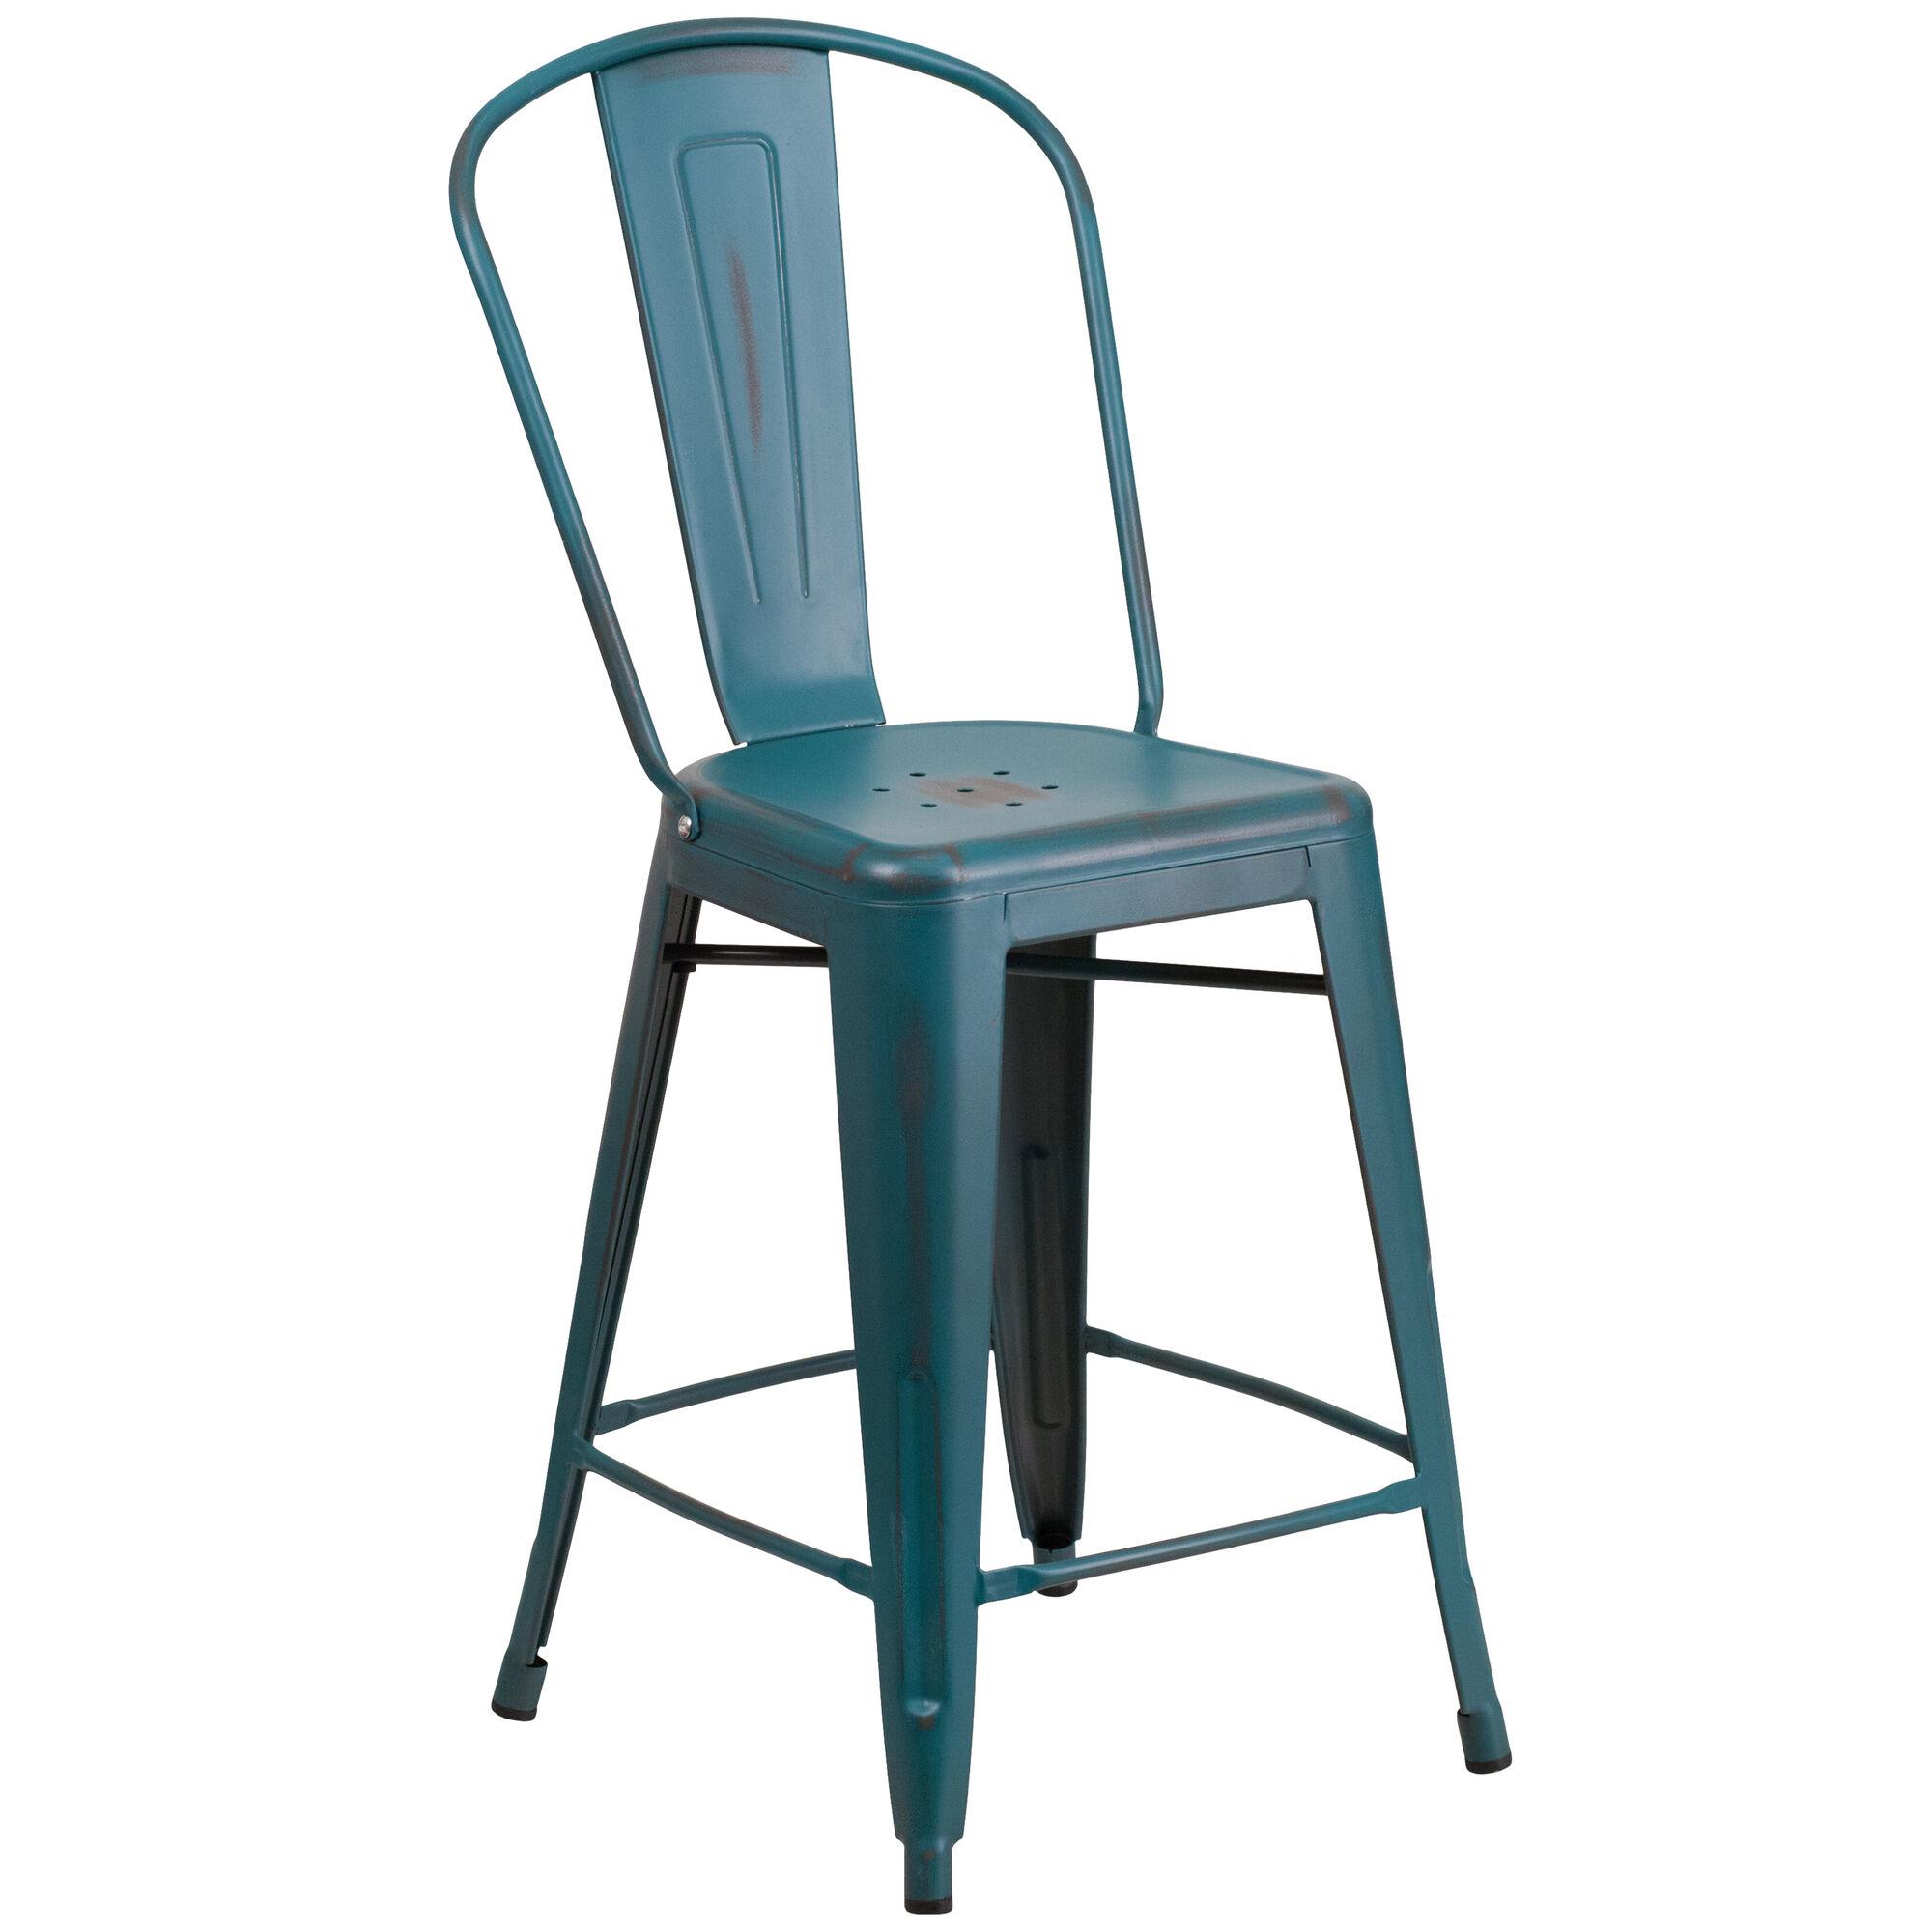 Flash furniture 24 39 39 high distressed kelly blue teal metal for Furniture 24